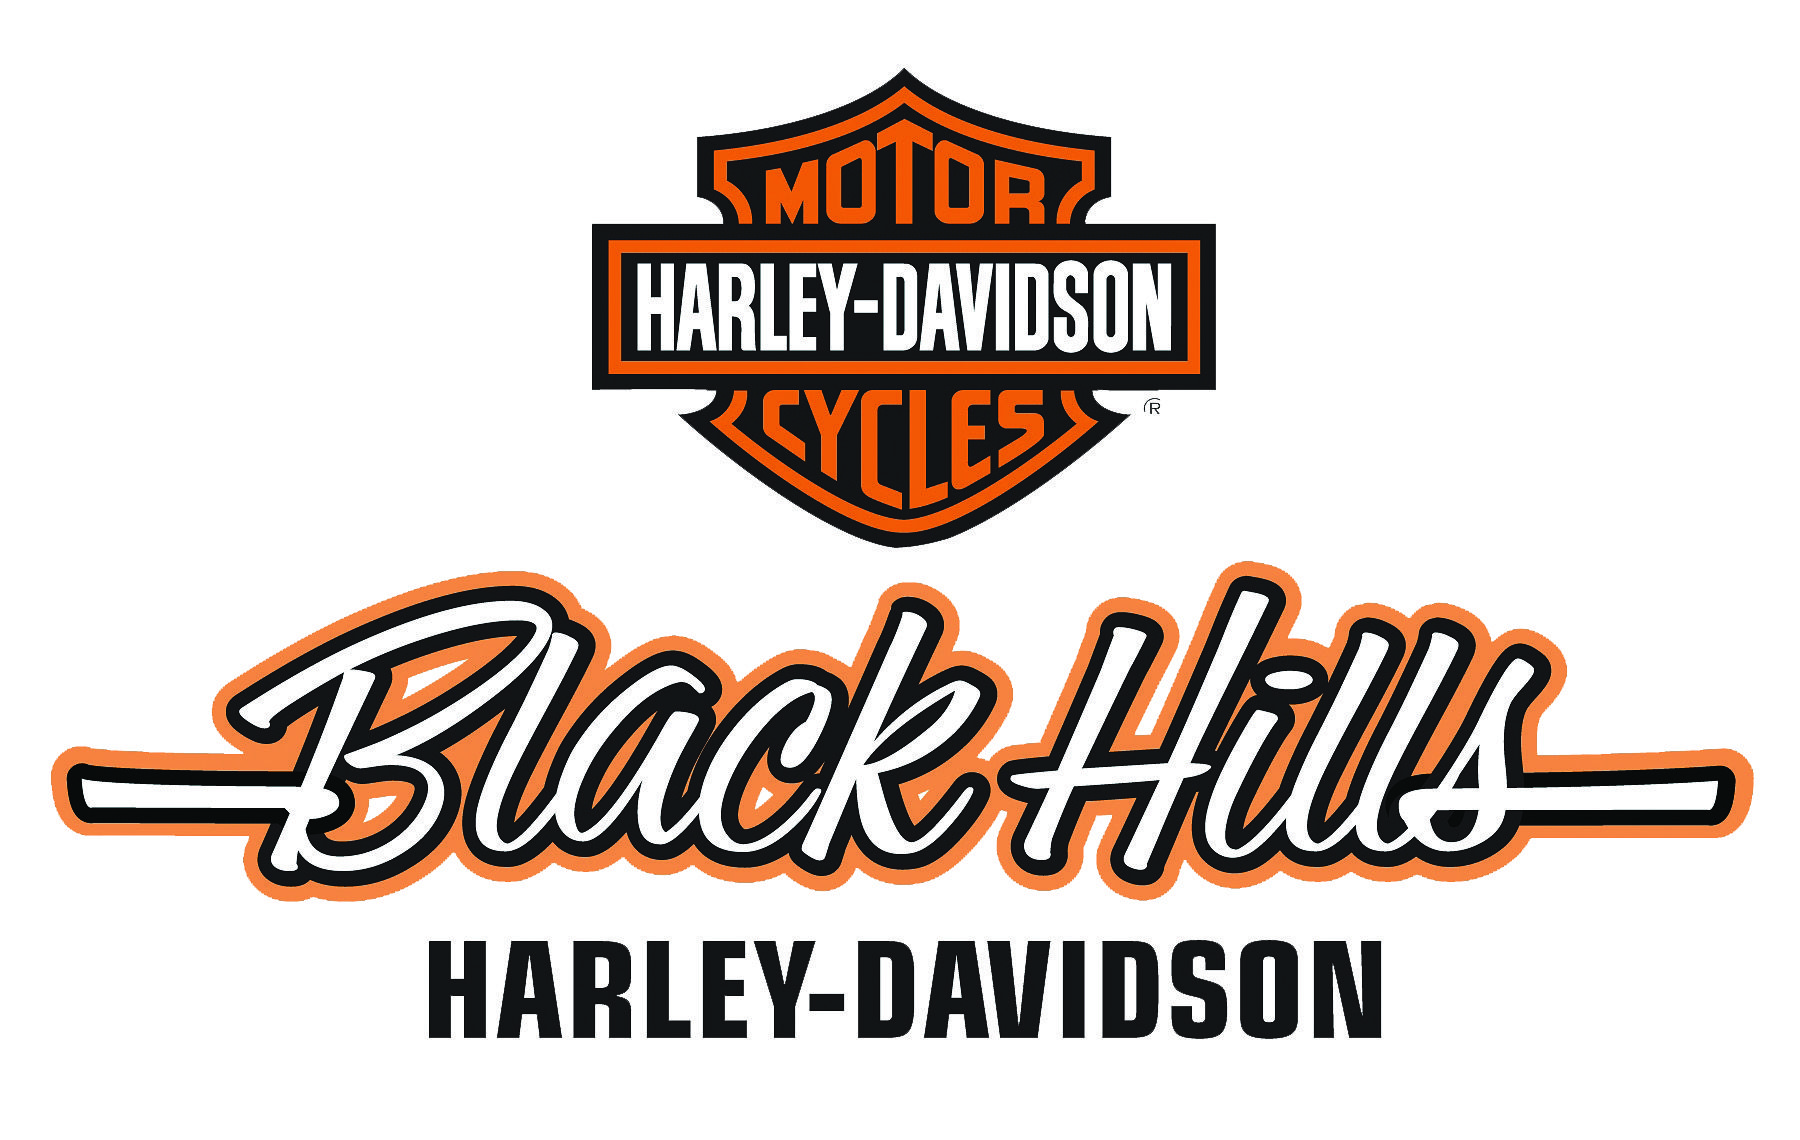 Black hills harleydavidson is giving our winner a week